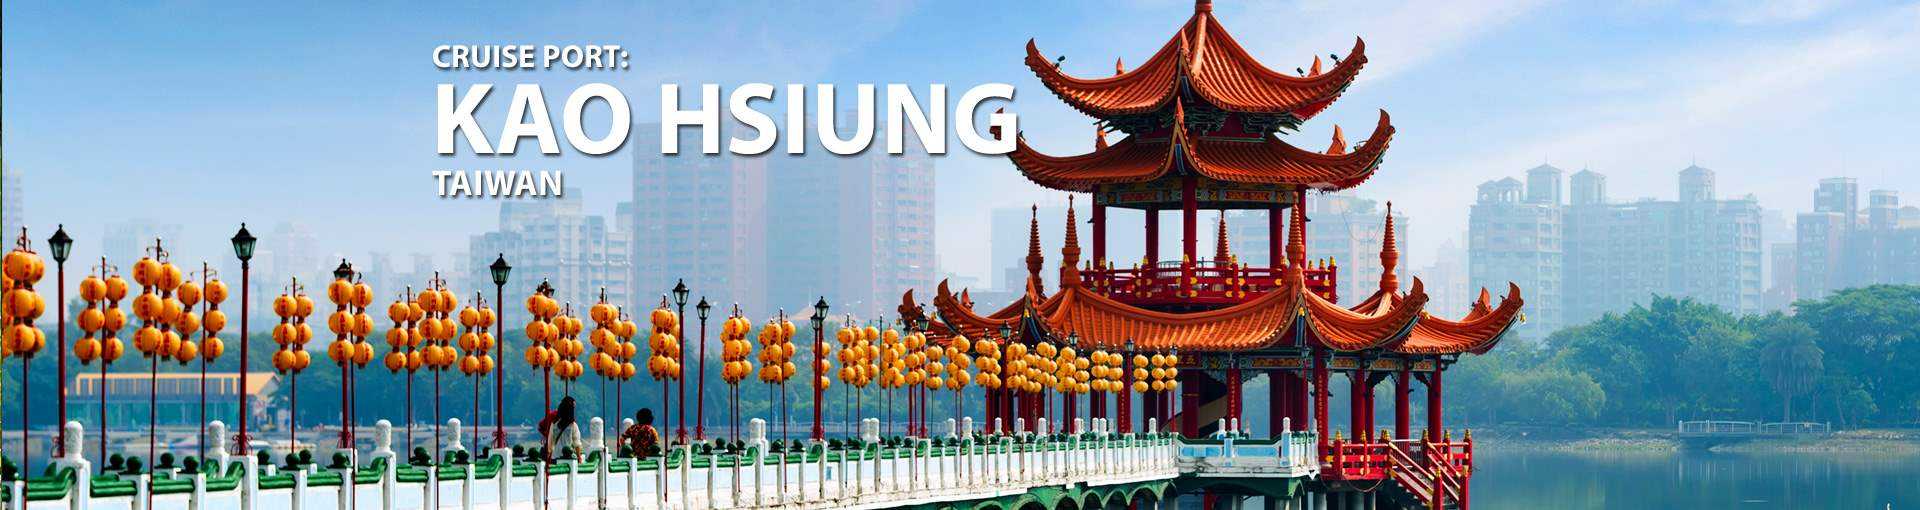 Cruise Port: Kao Hsiung, Taiwan